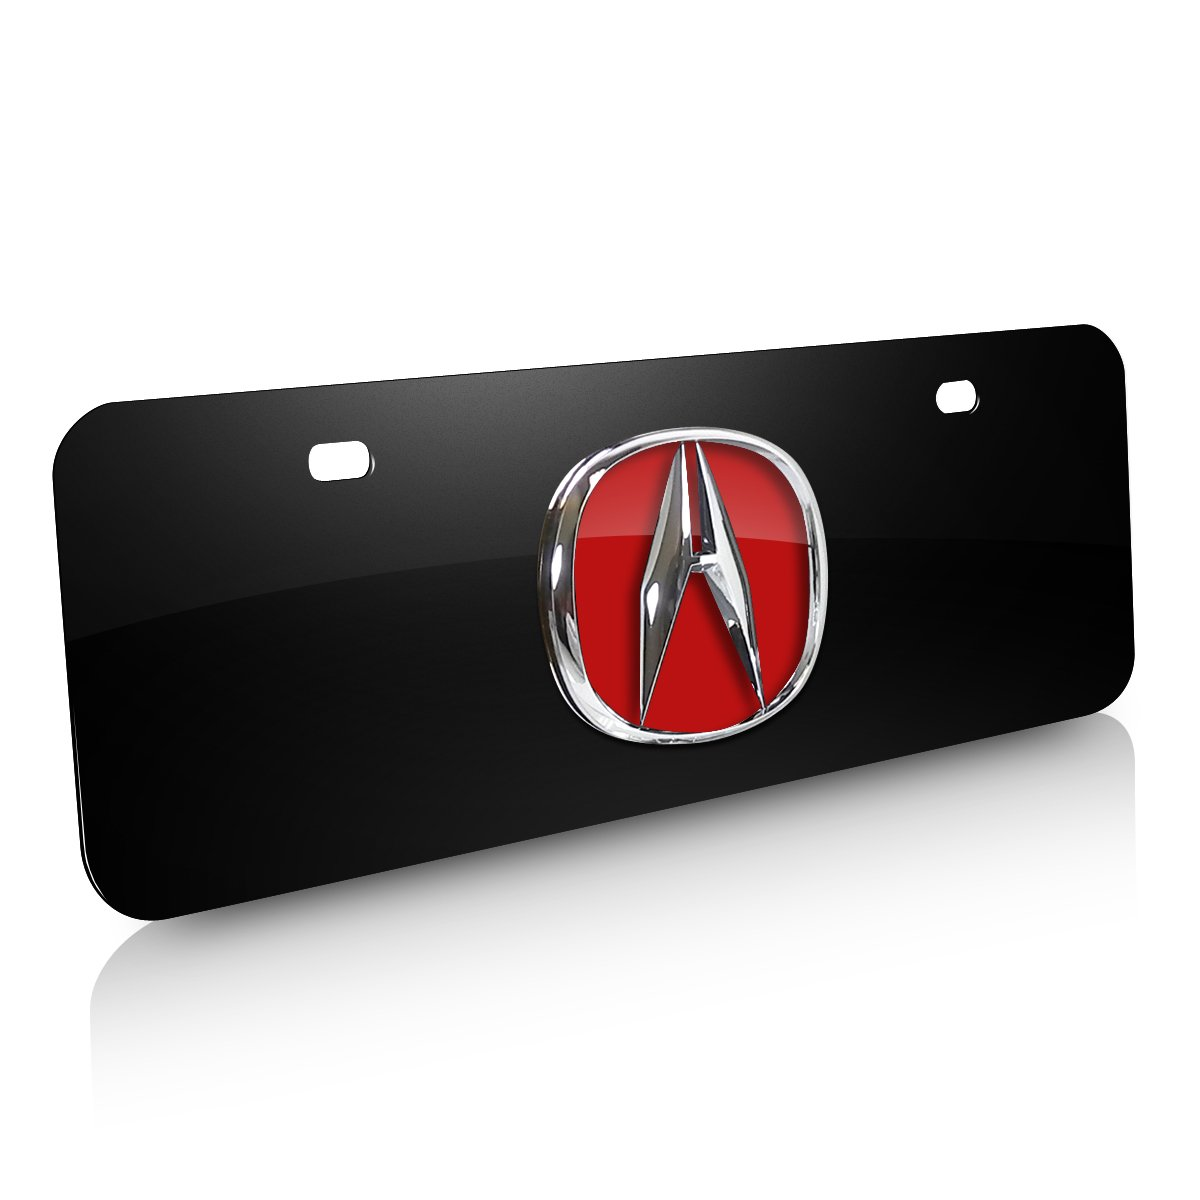 INC Au-Tomotive Gold Acura Red 3D Logo Half-size Black Metal License Plate